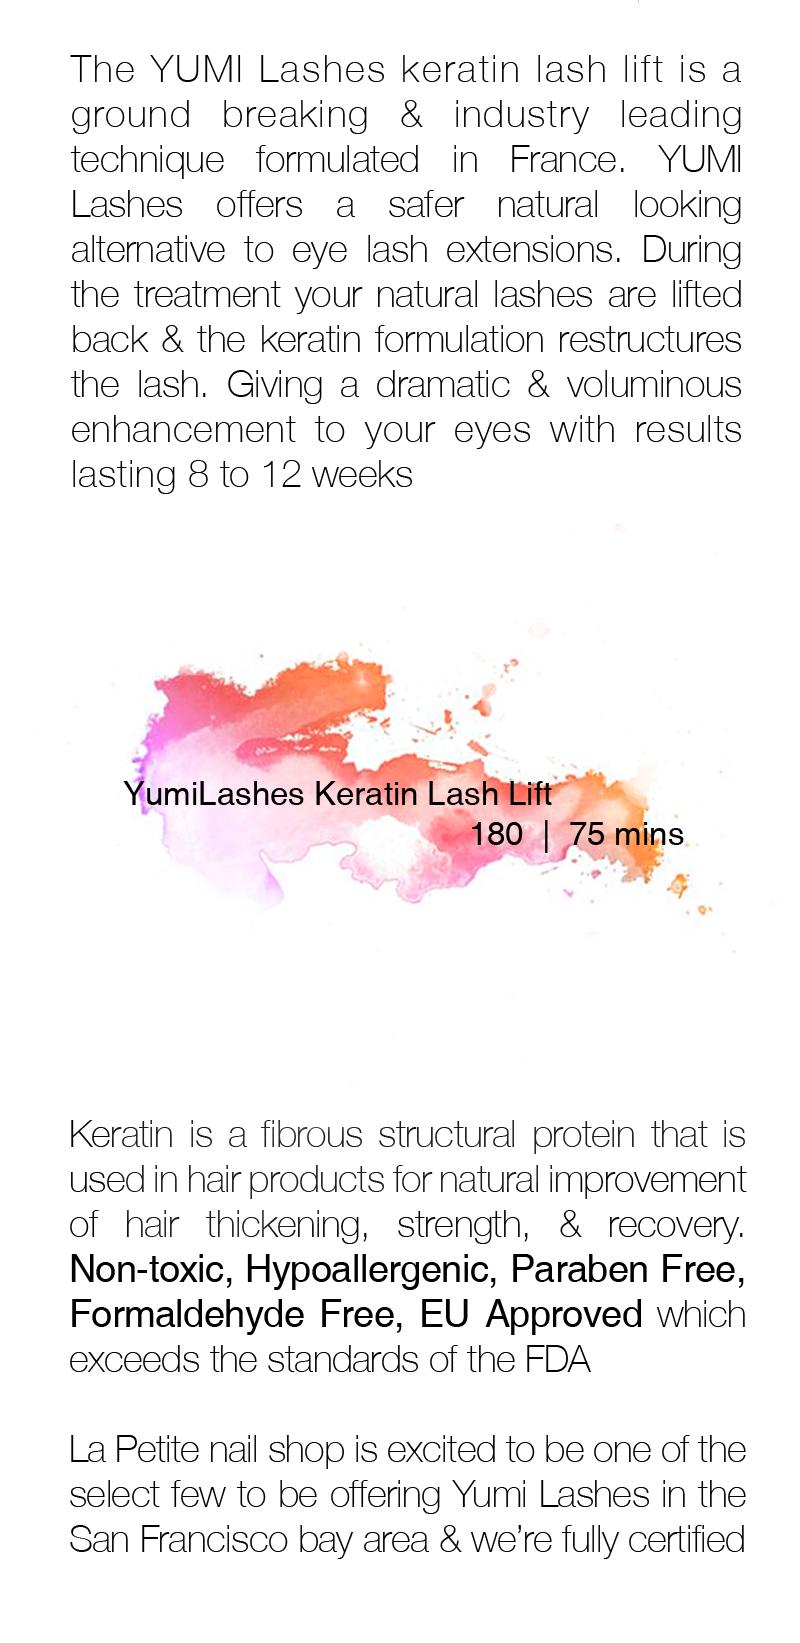 YUMI_web2_text2price.png